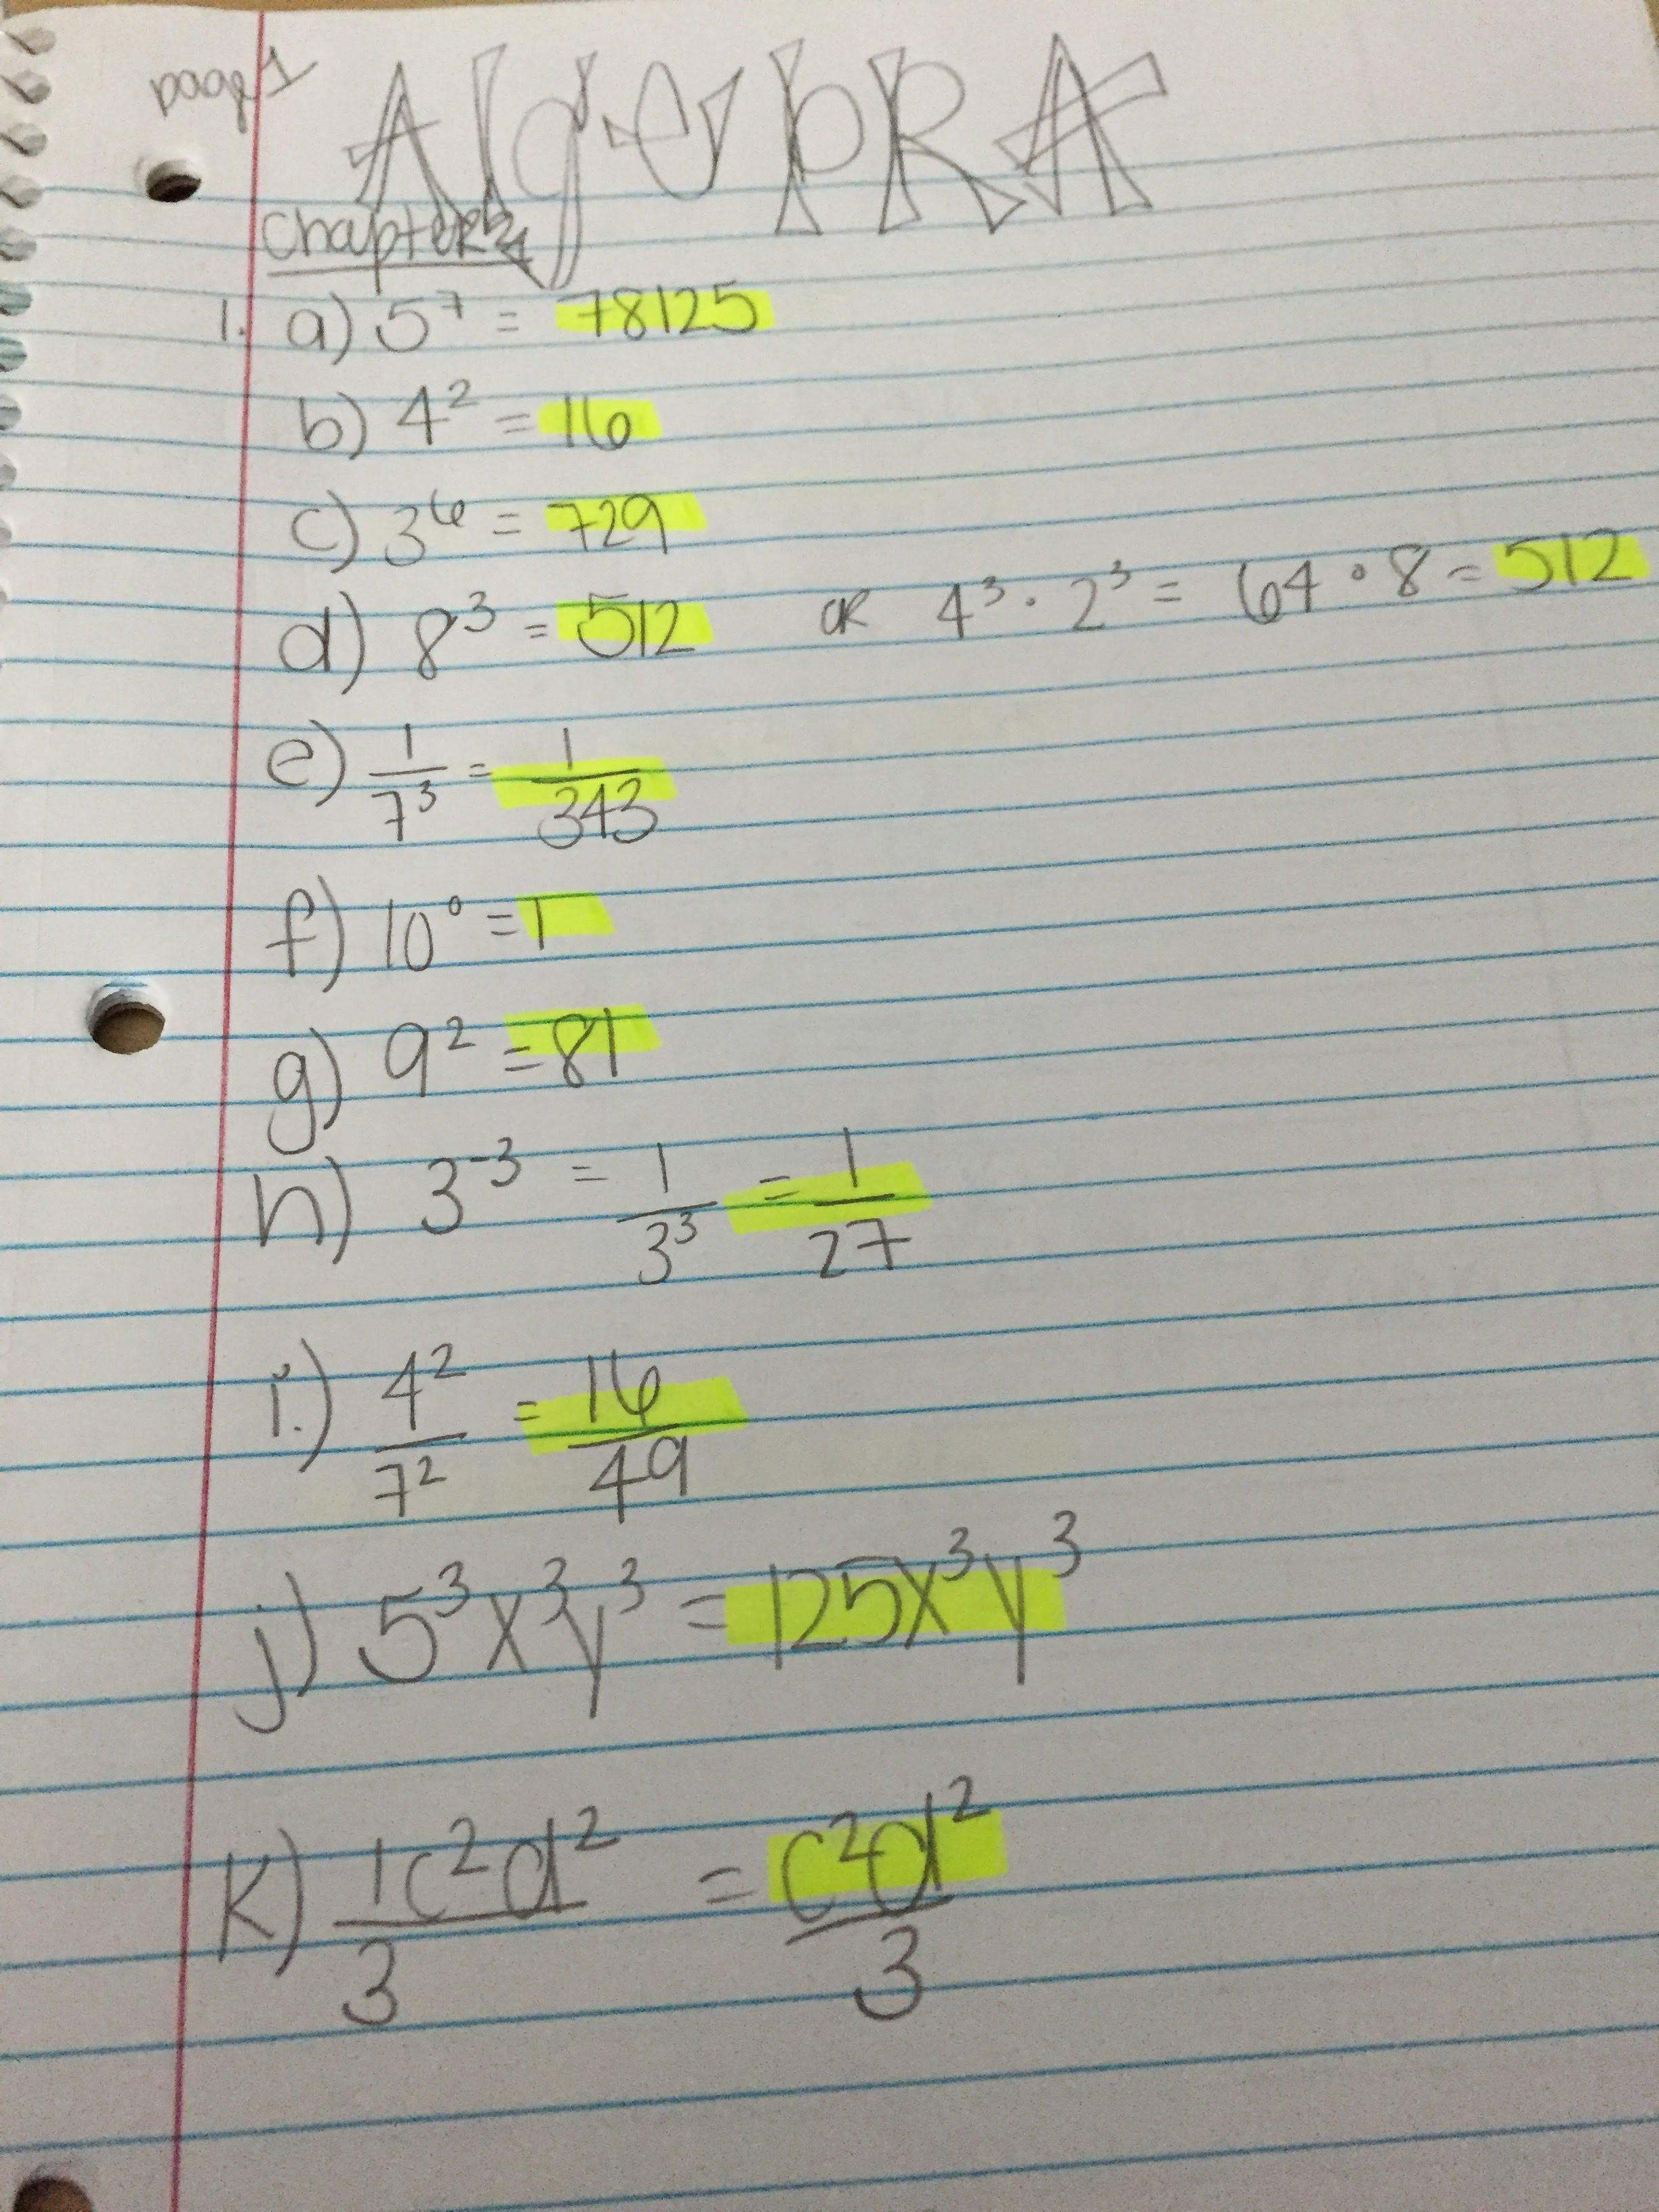 Algebra 1 Final Exam With Answers